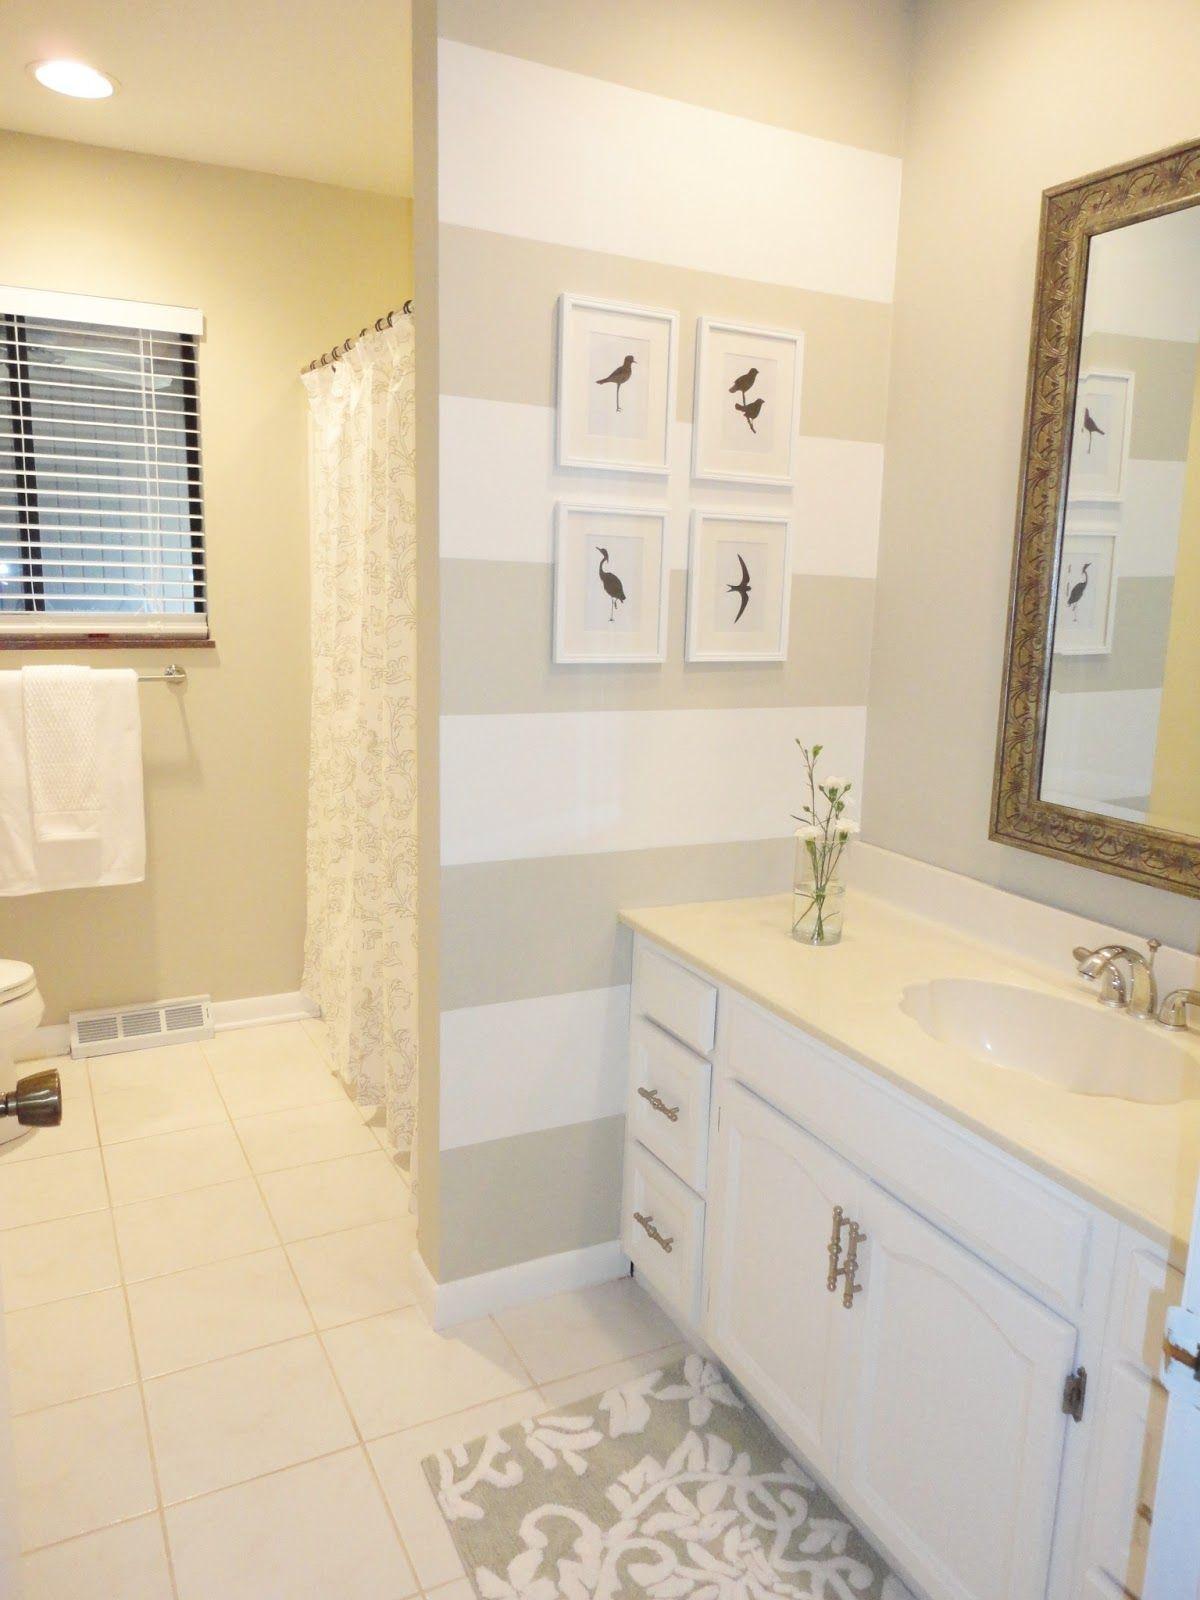 LiveLoveDIY Our Guest Bathroom Makeover LiveLoveDIY Our